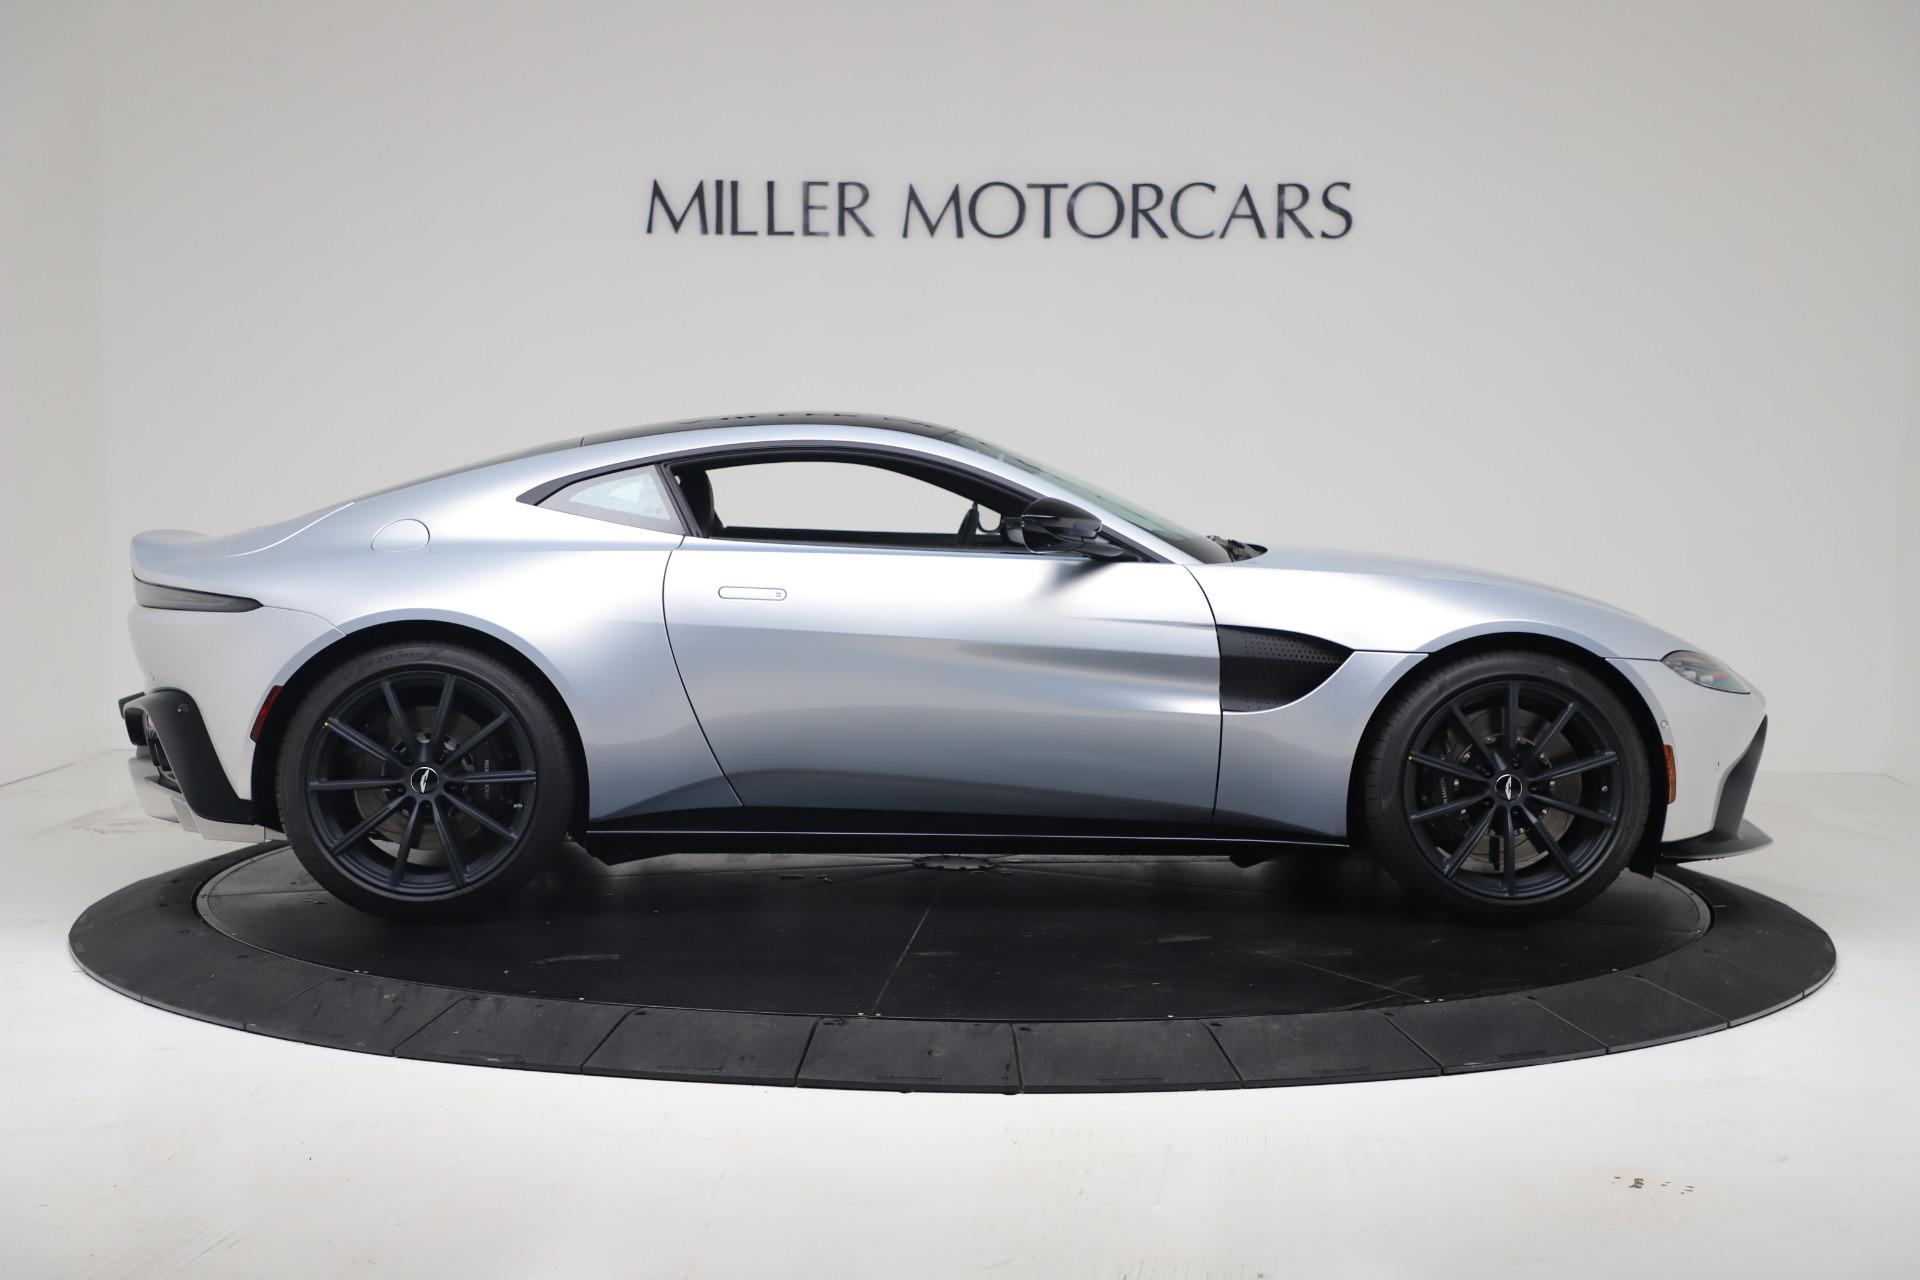 New 2020 Aston Martin Vantage V8 For Sale In Westport, CT 3481_p12